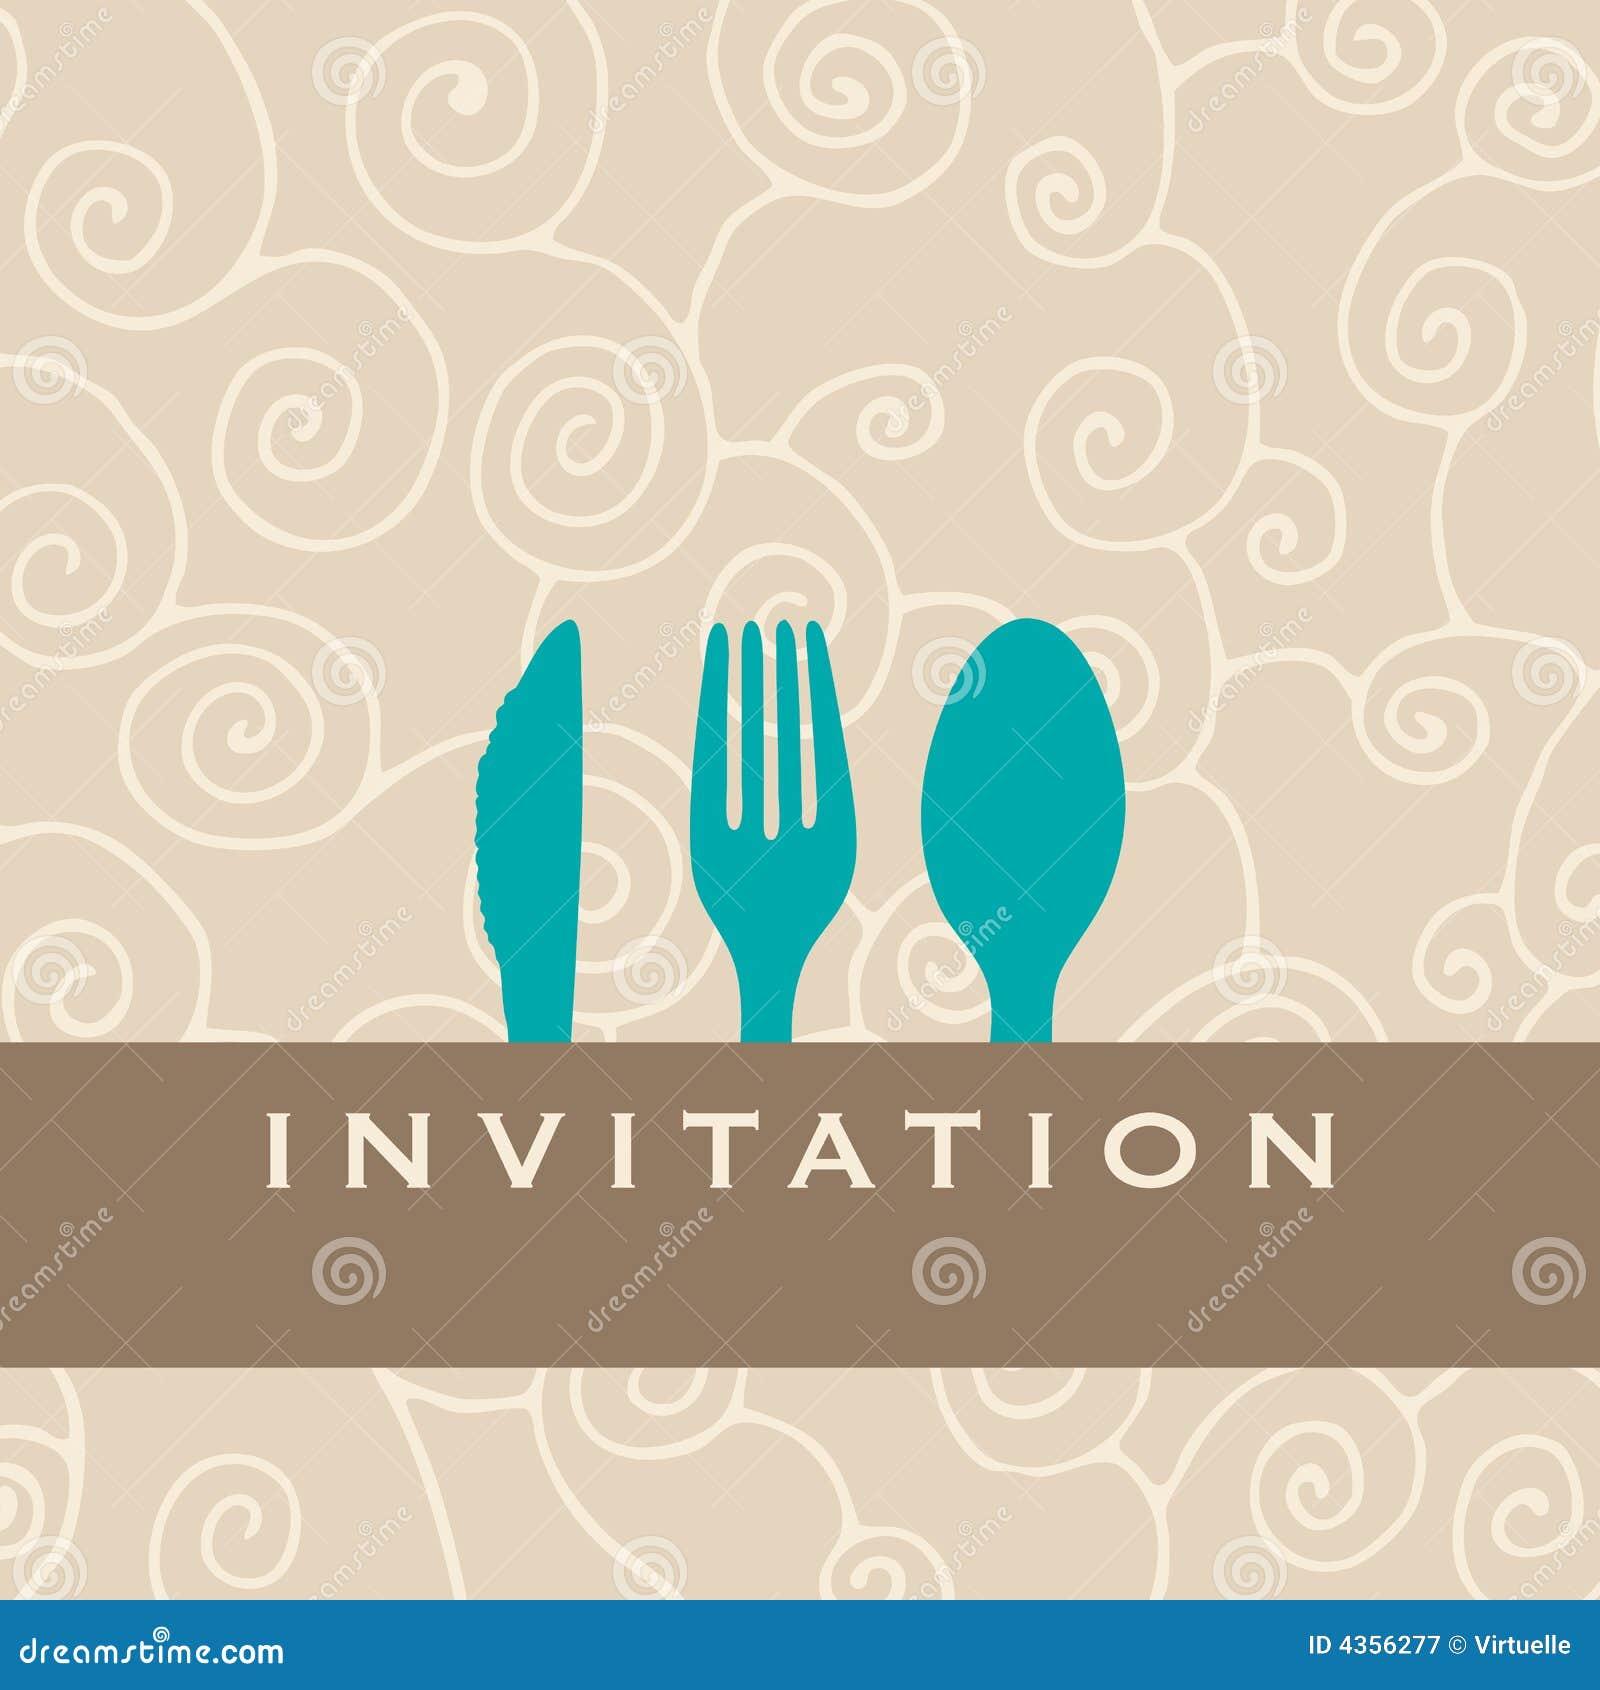 clipart invitation repas - photo #7